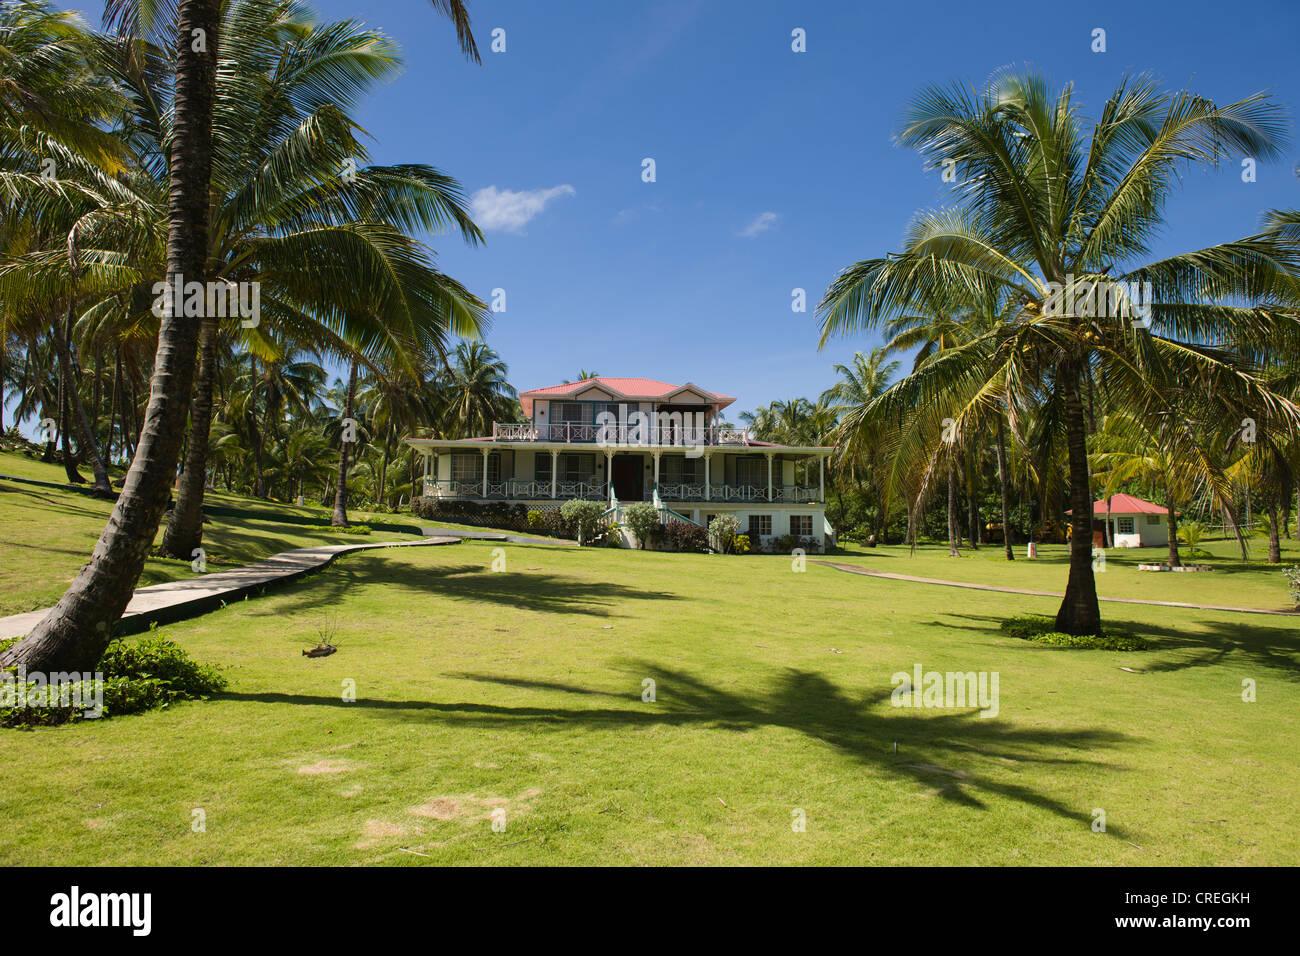 Weekend home of President Daniel Ortega, Big Corn Island, Caribbean Sea, Nicaragua, Central America Stock Photo